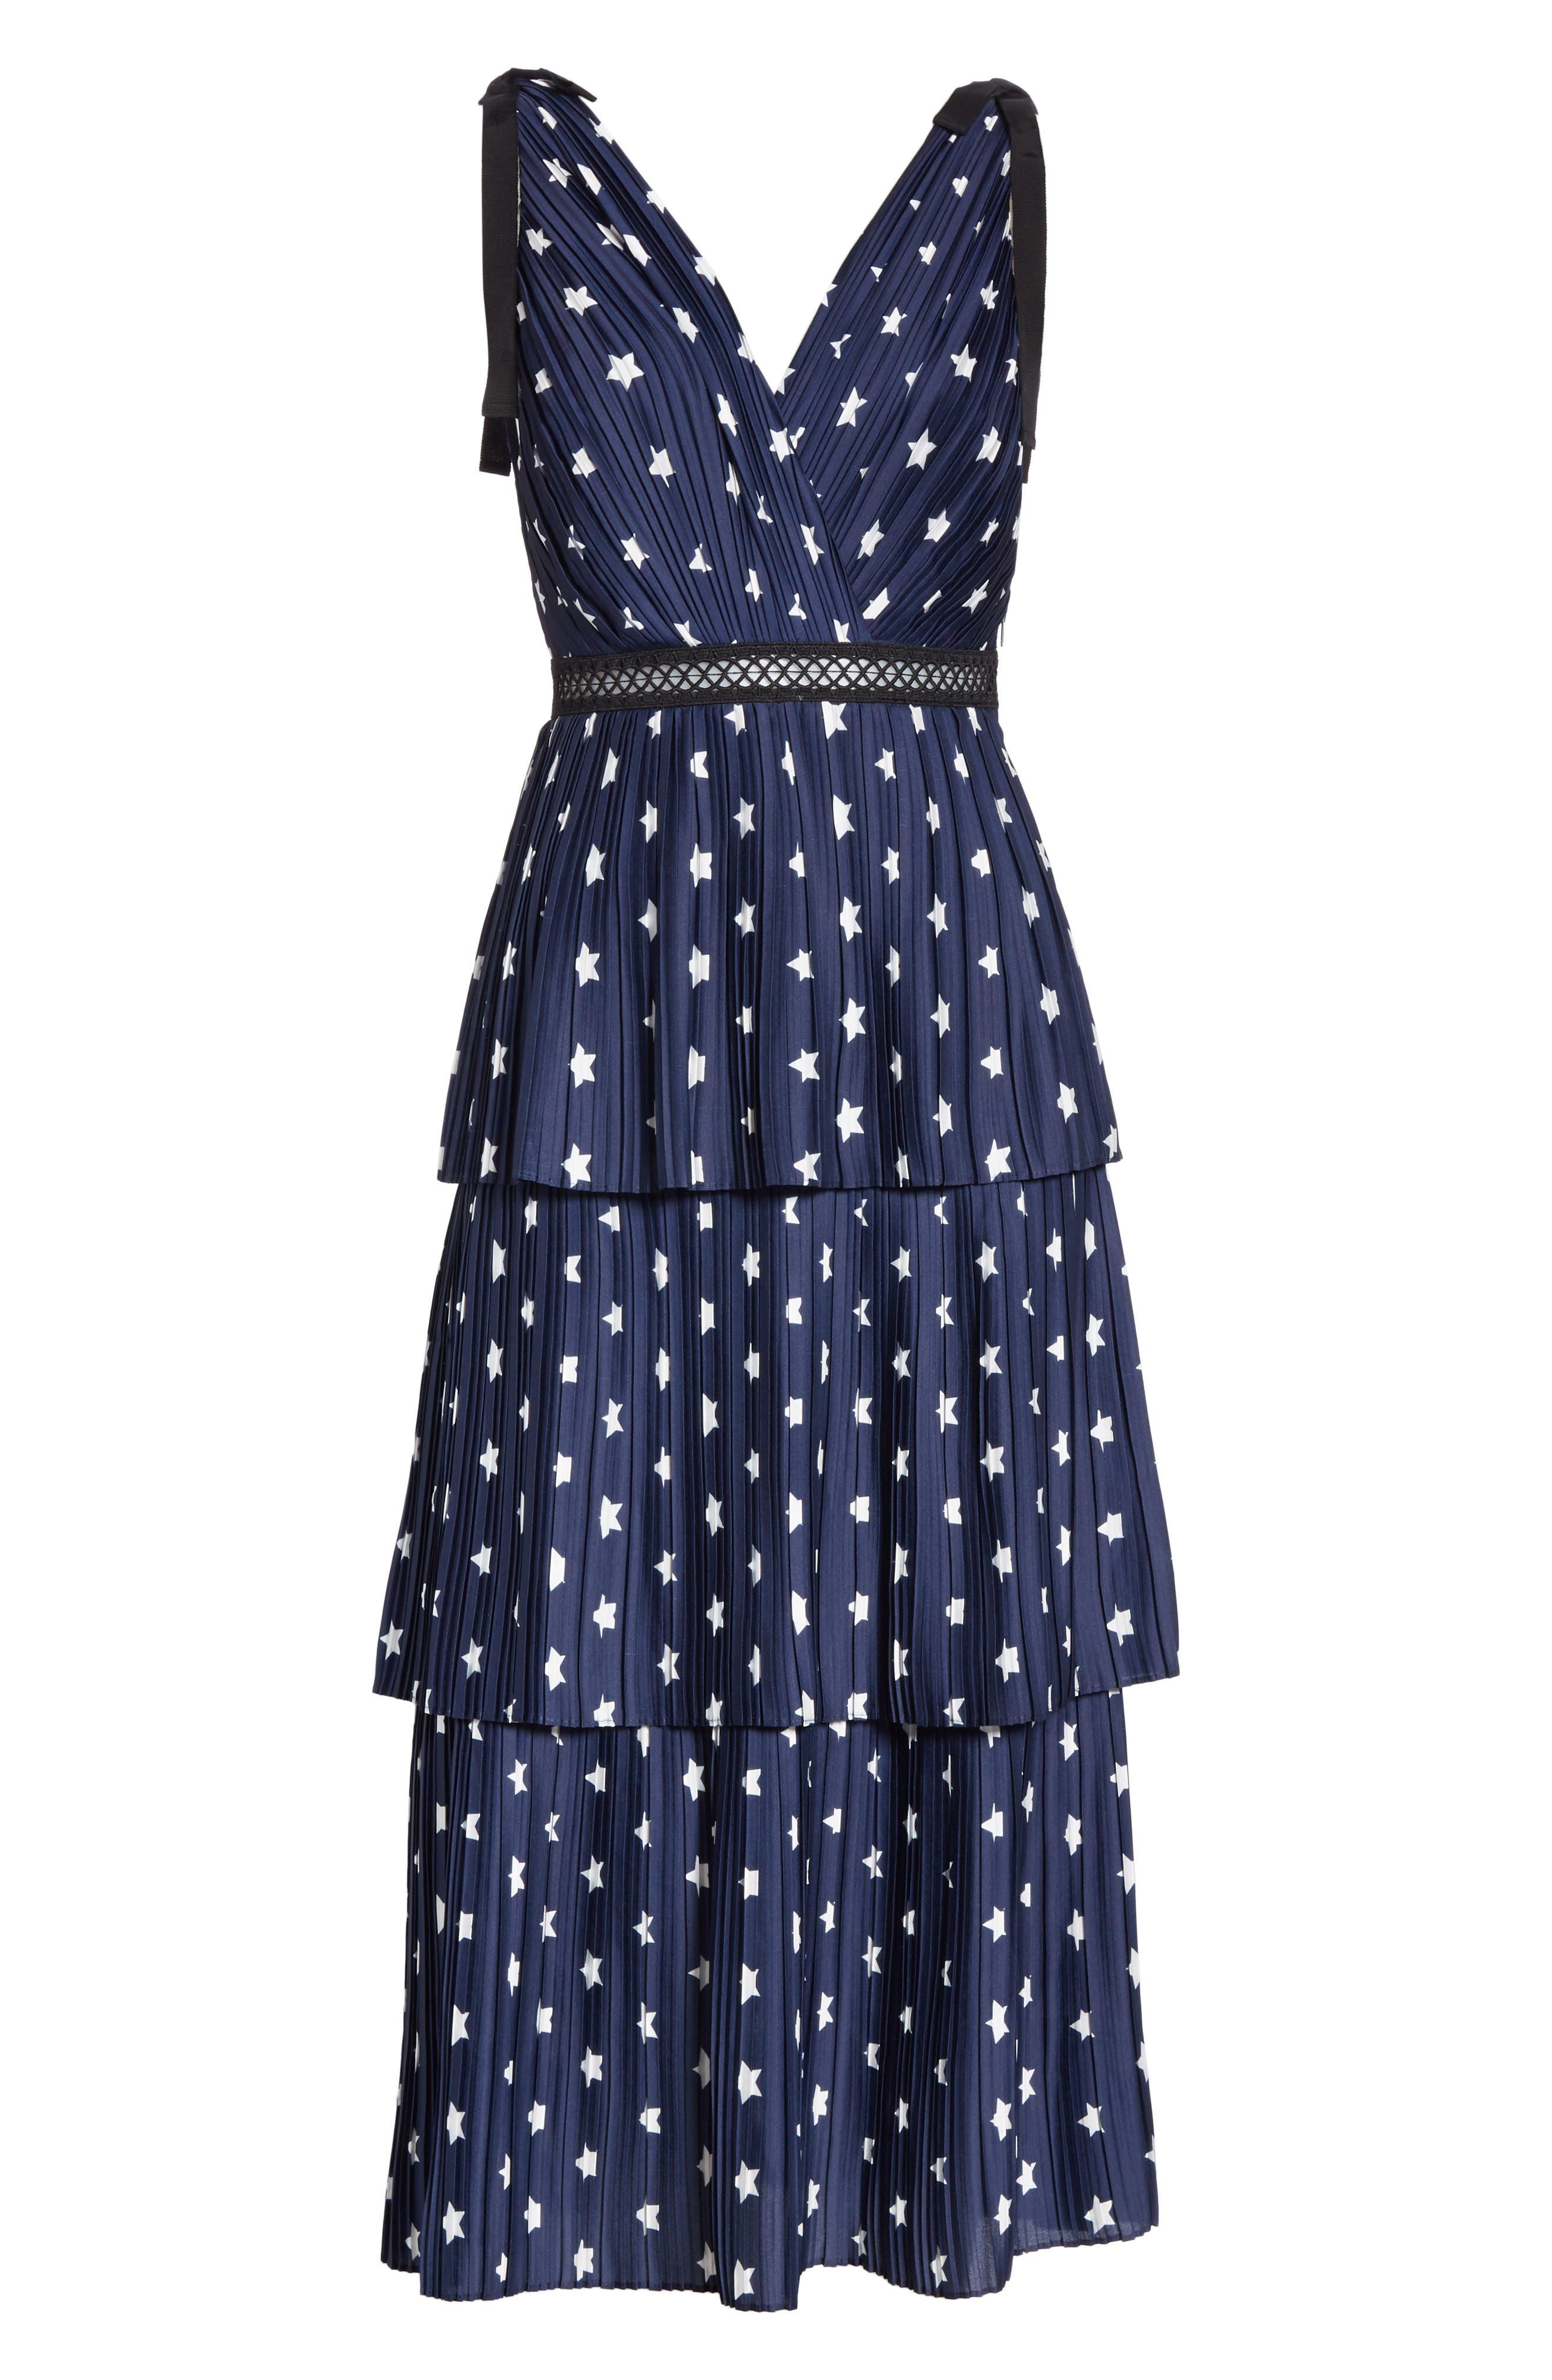 Star Print Tiered Midi Dress,                             Alternate thumbnail 6, color,                             400